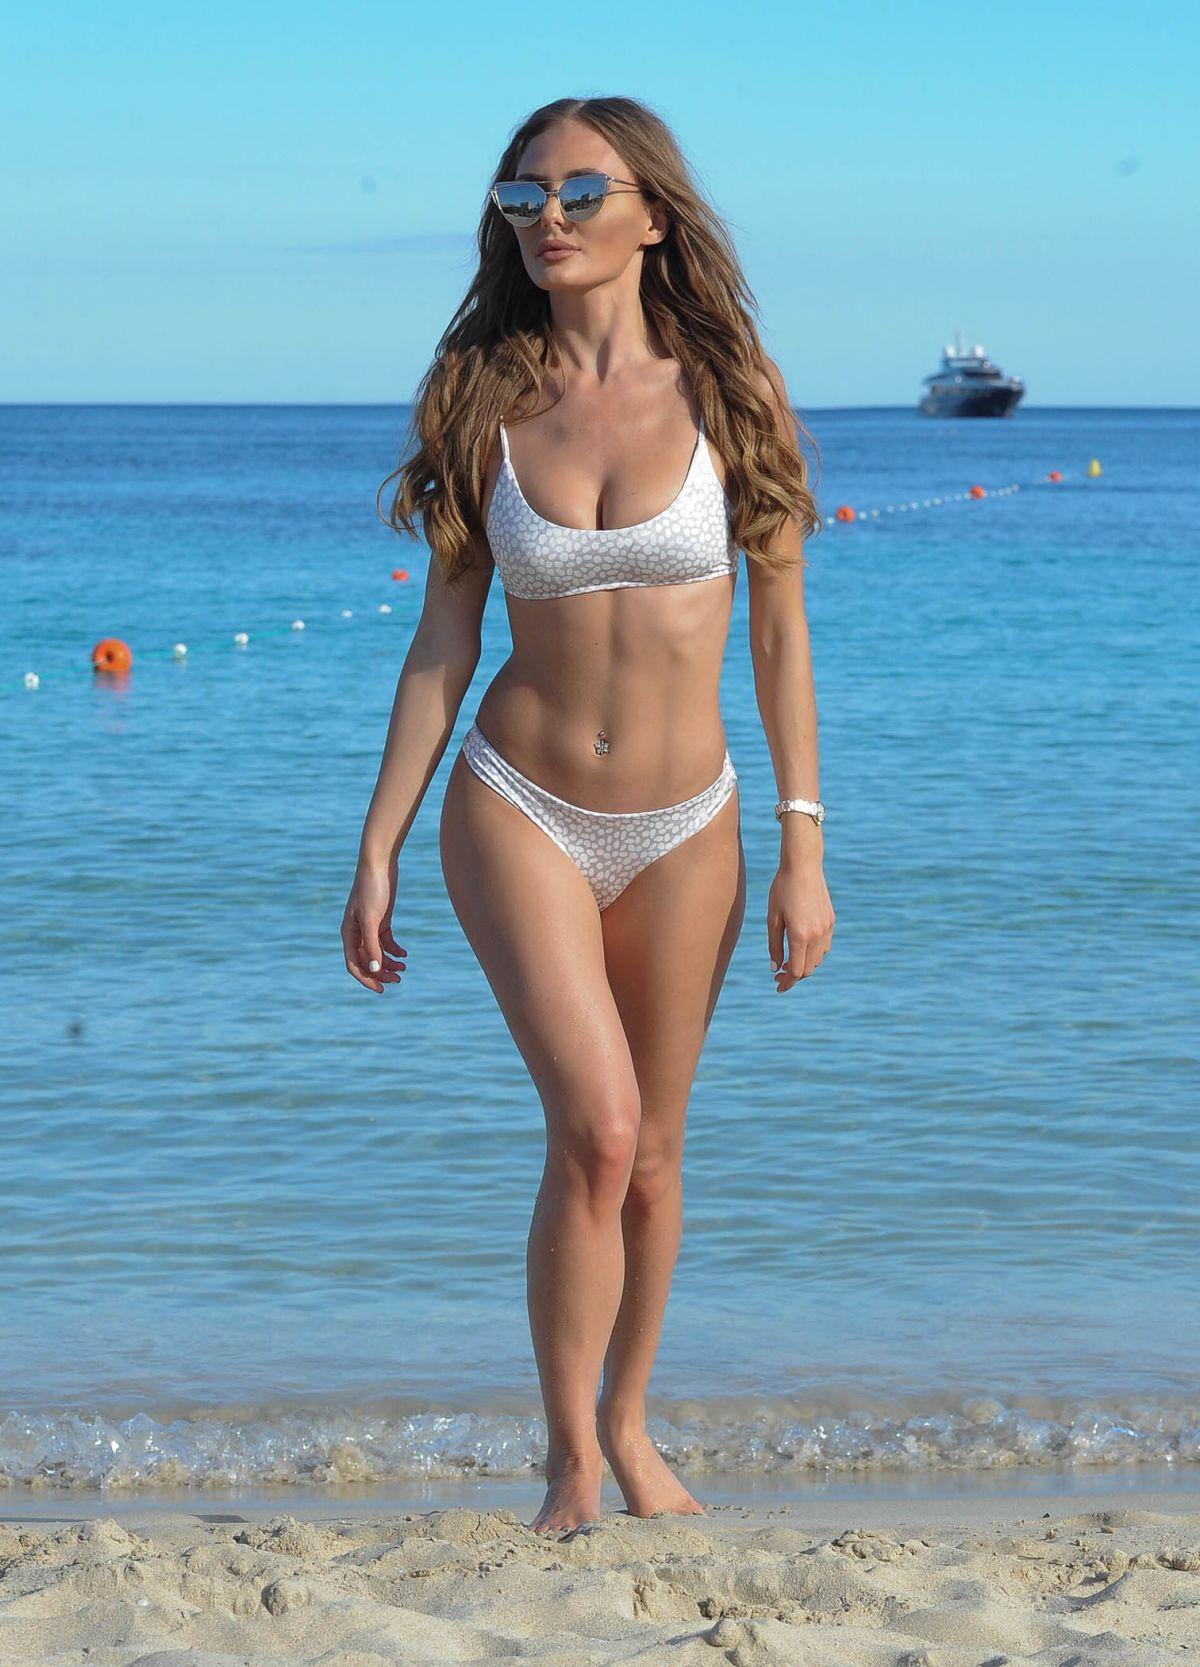 Bikini Tanya Clarke nude photos 2019